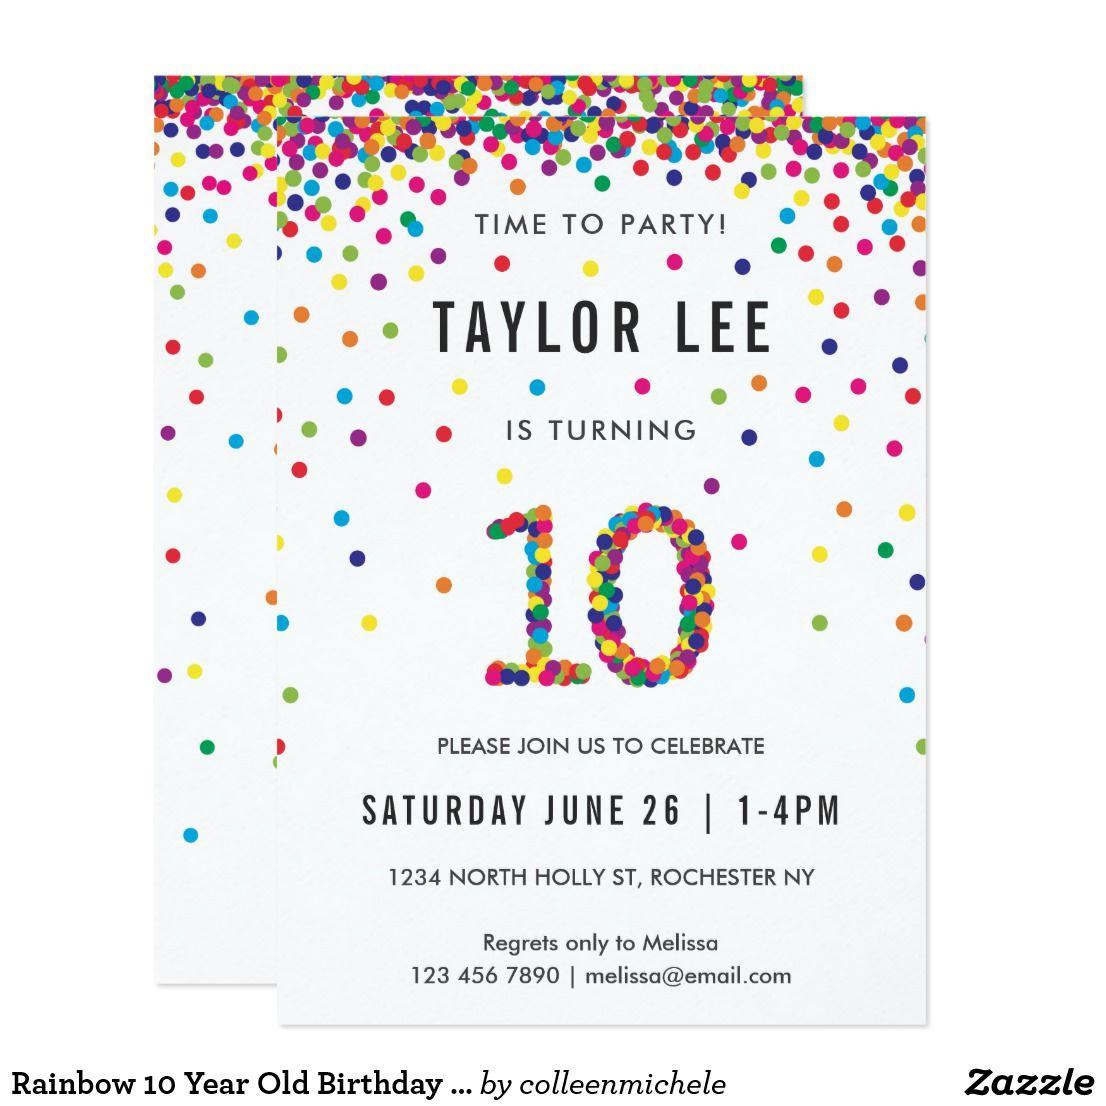 rainbow 10 year old birthday party